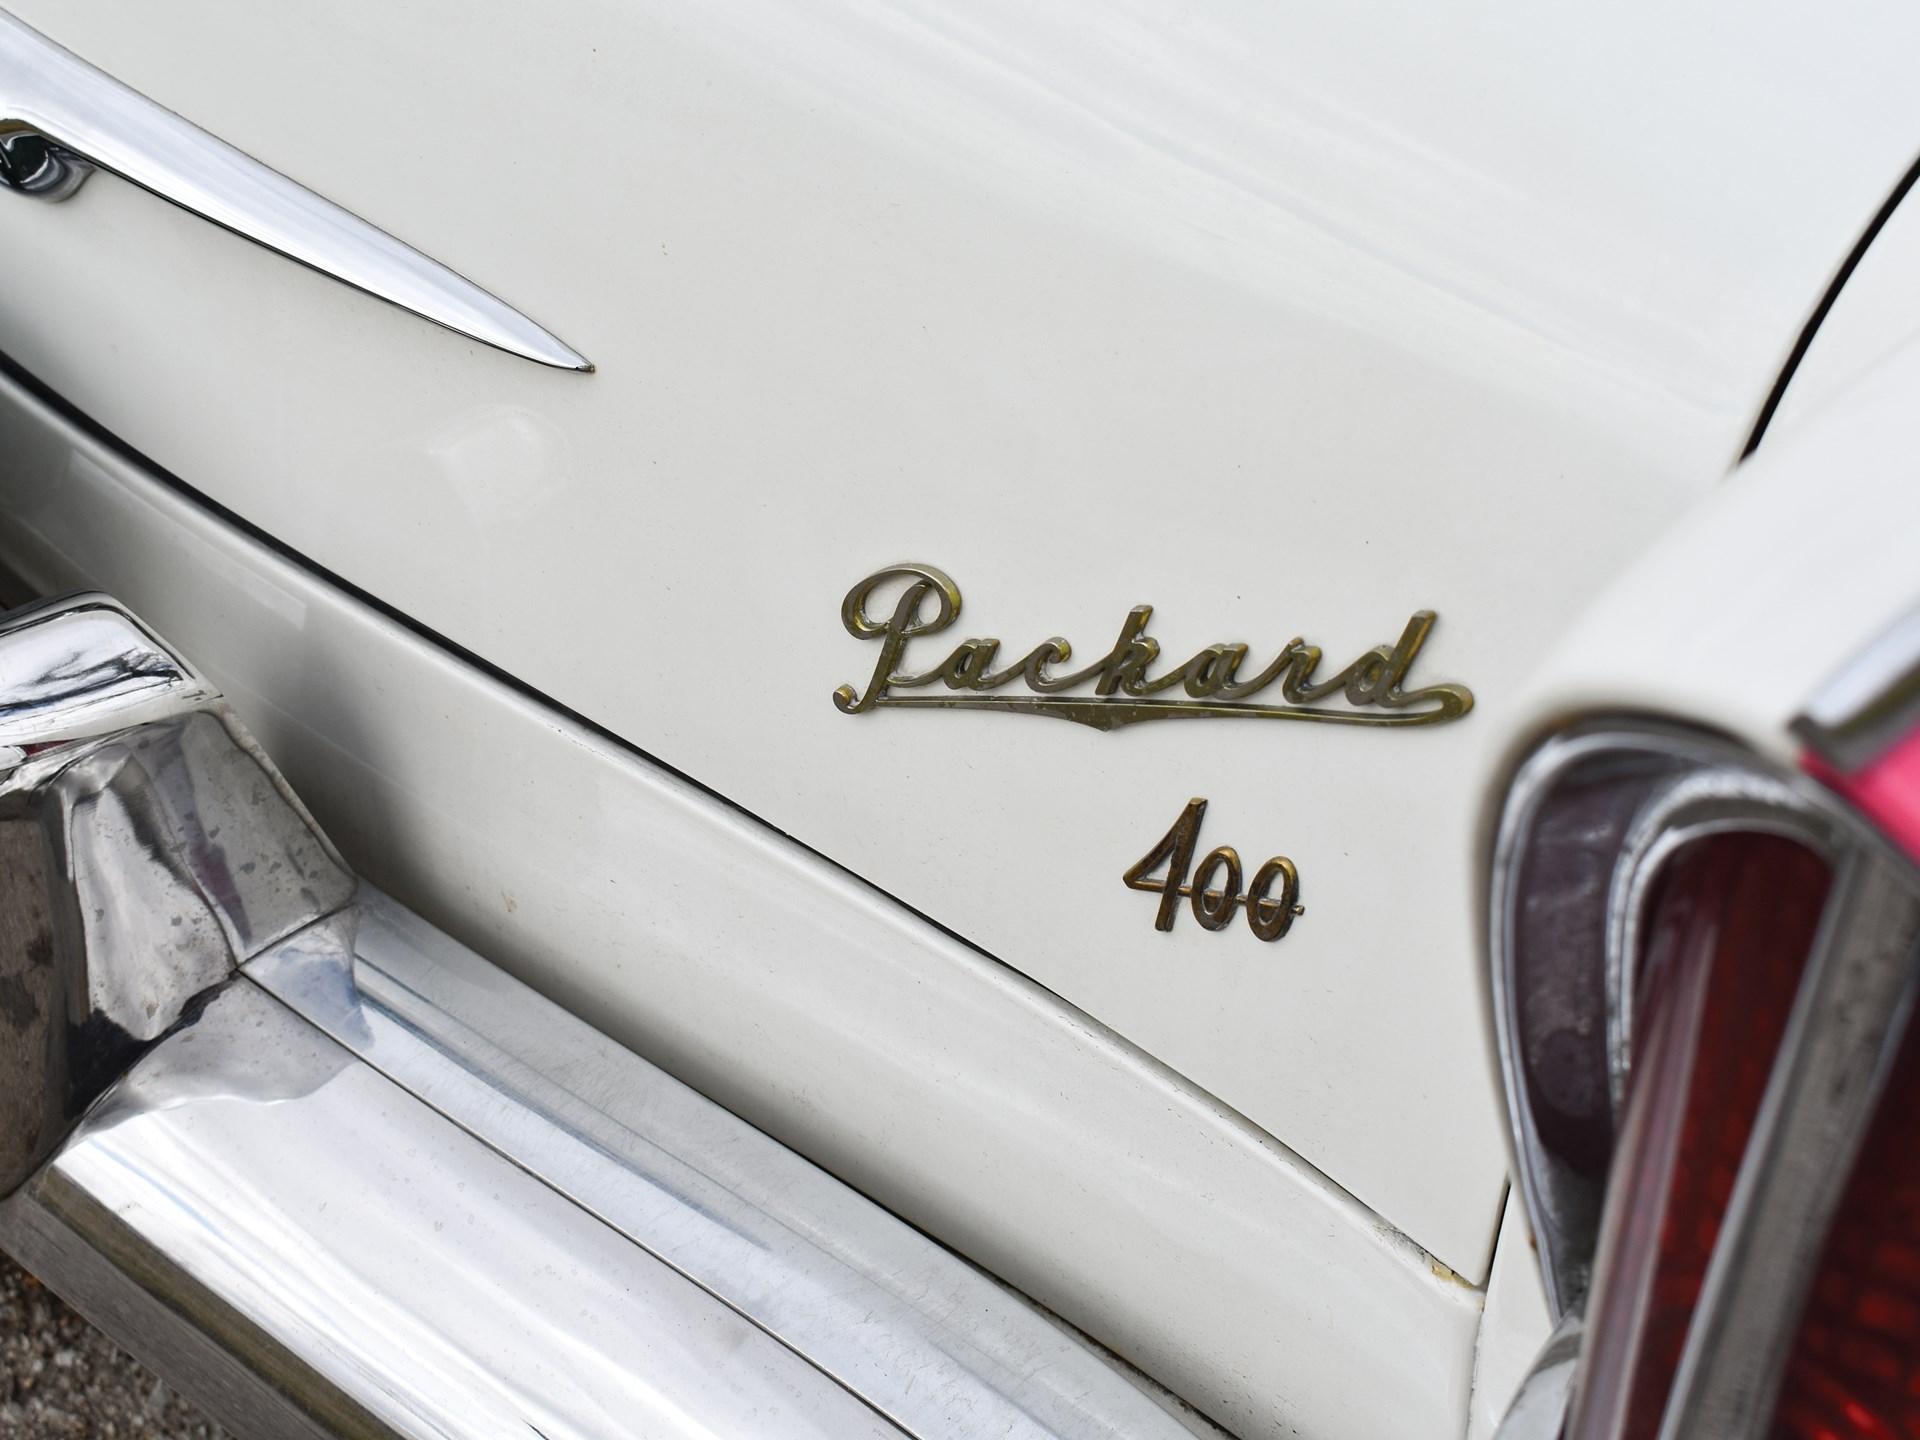 1955 Packard Four Hundred